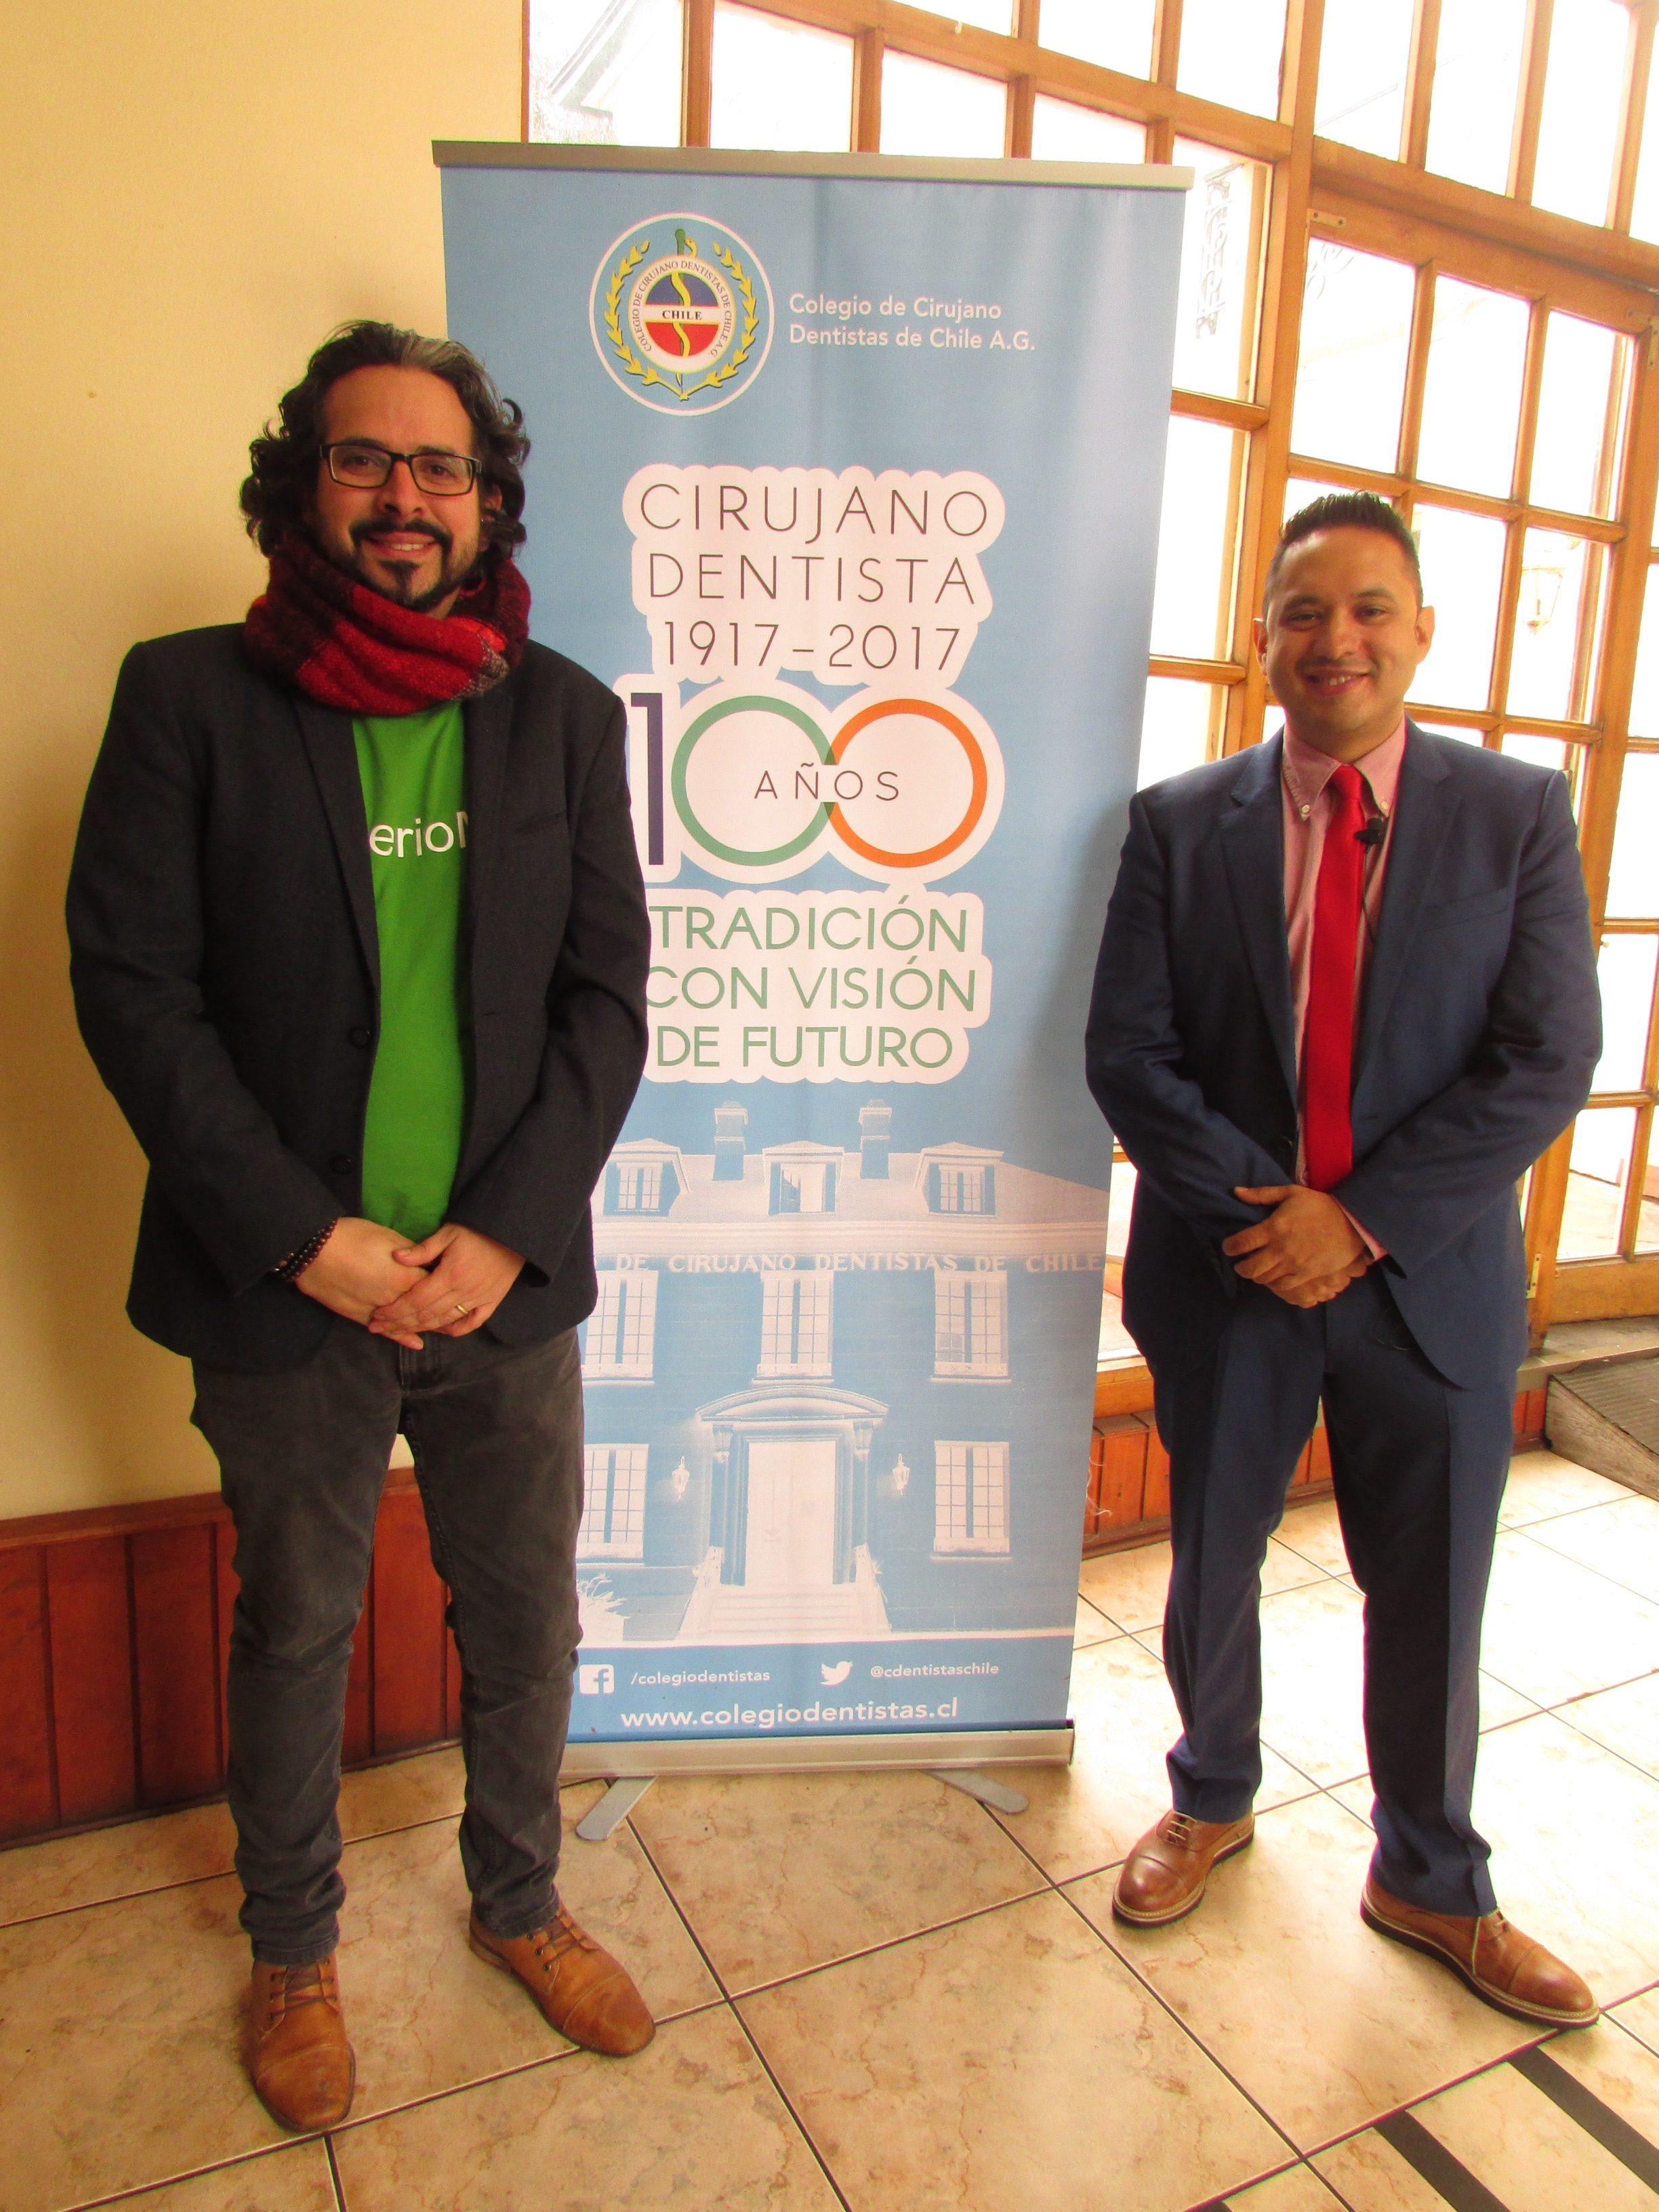 De izq. a der.: Sebastián Jiménez, director ejecutivo Encuentro Odontológico; Dr. Carlos Monteagudo, dictante conferencia.